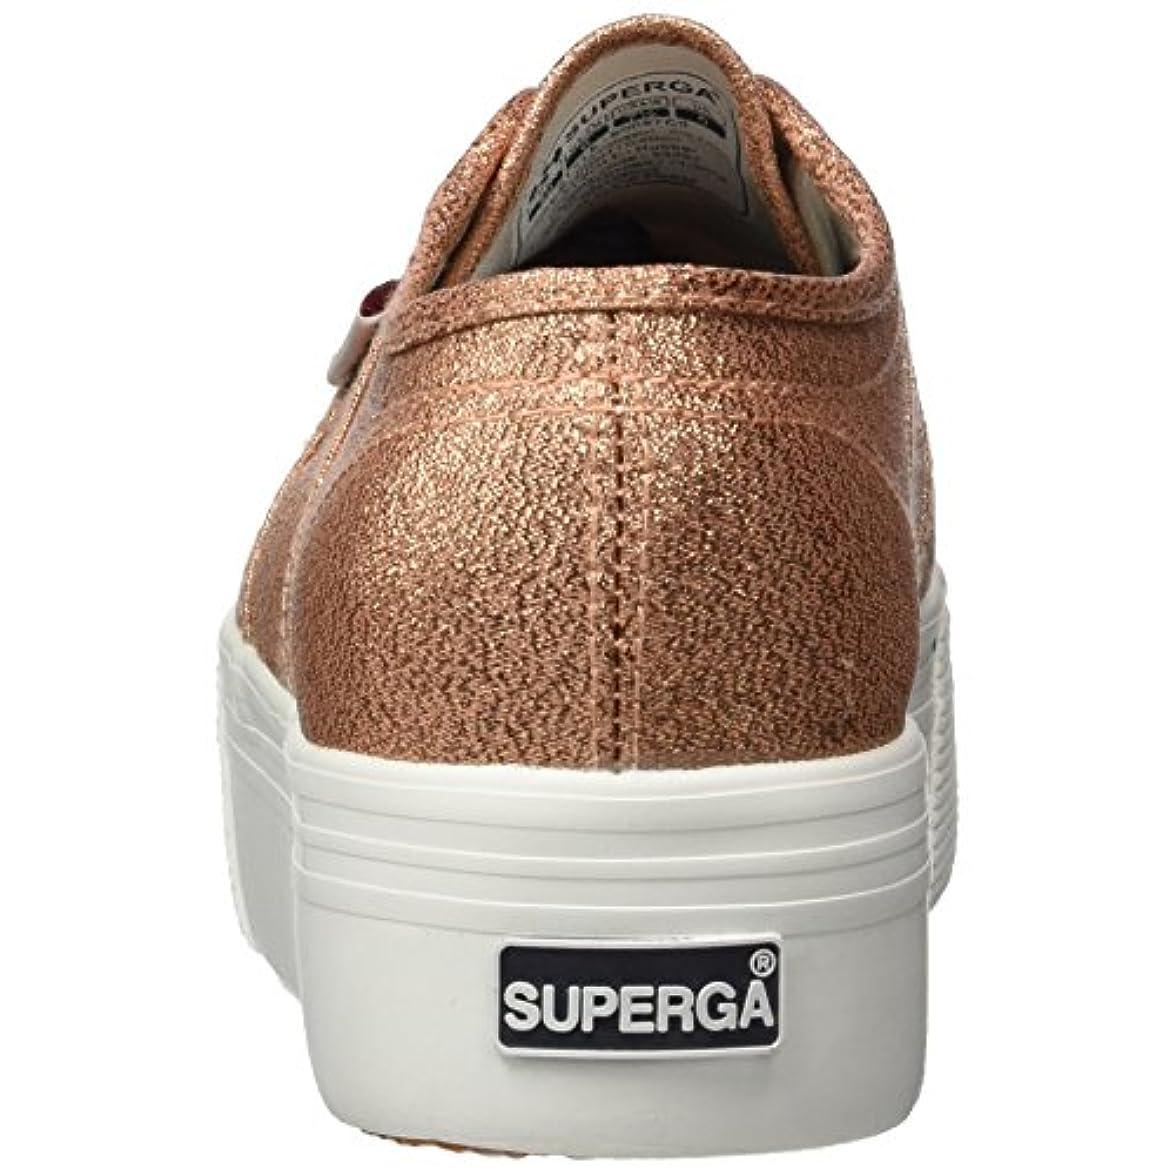 Superga S009tc0 S009tc0 Superga S009tc0 Superga